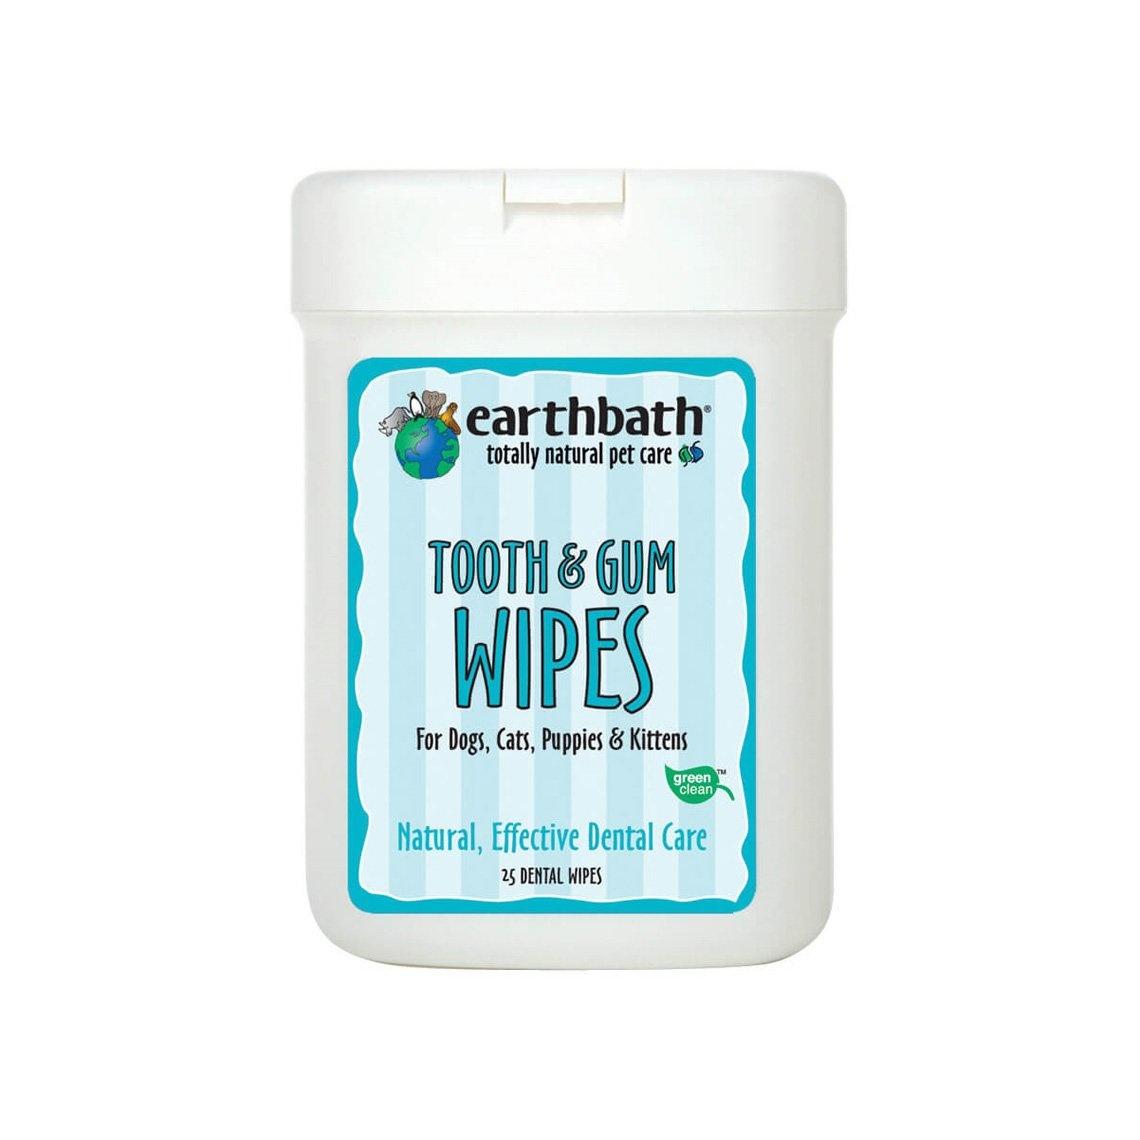 Earthbath Earthbath Tooth and Gum Wipes